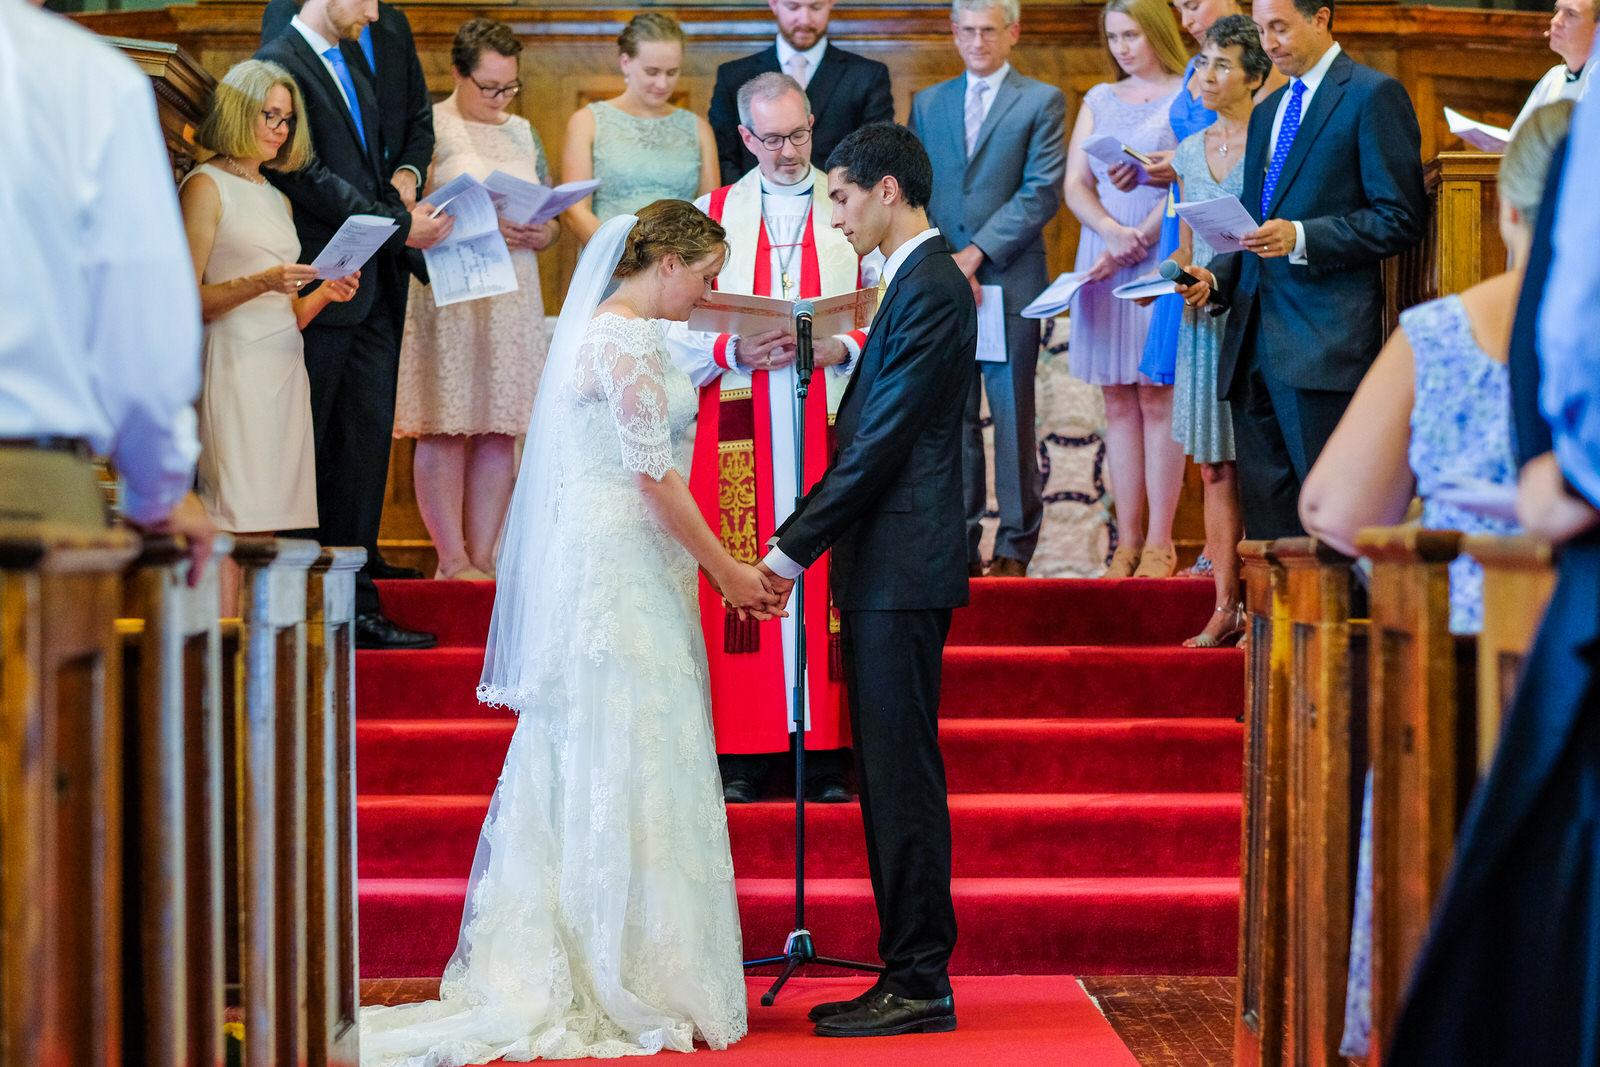 candid-vermont-wedding-photography-585.jpg